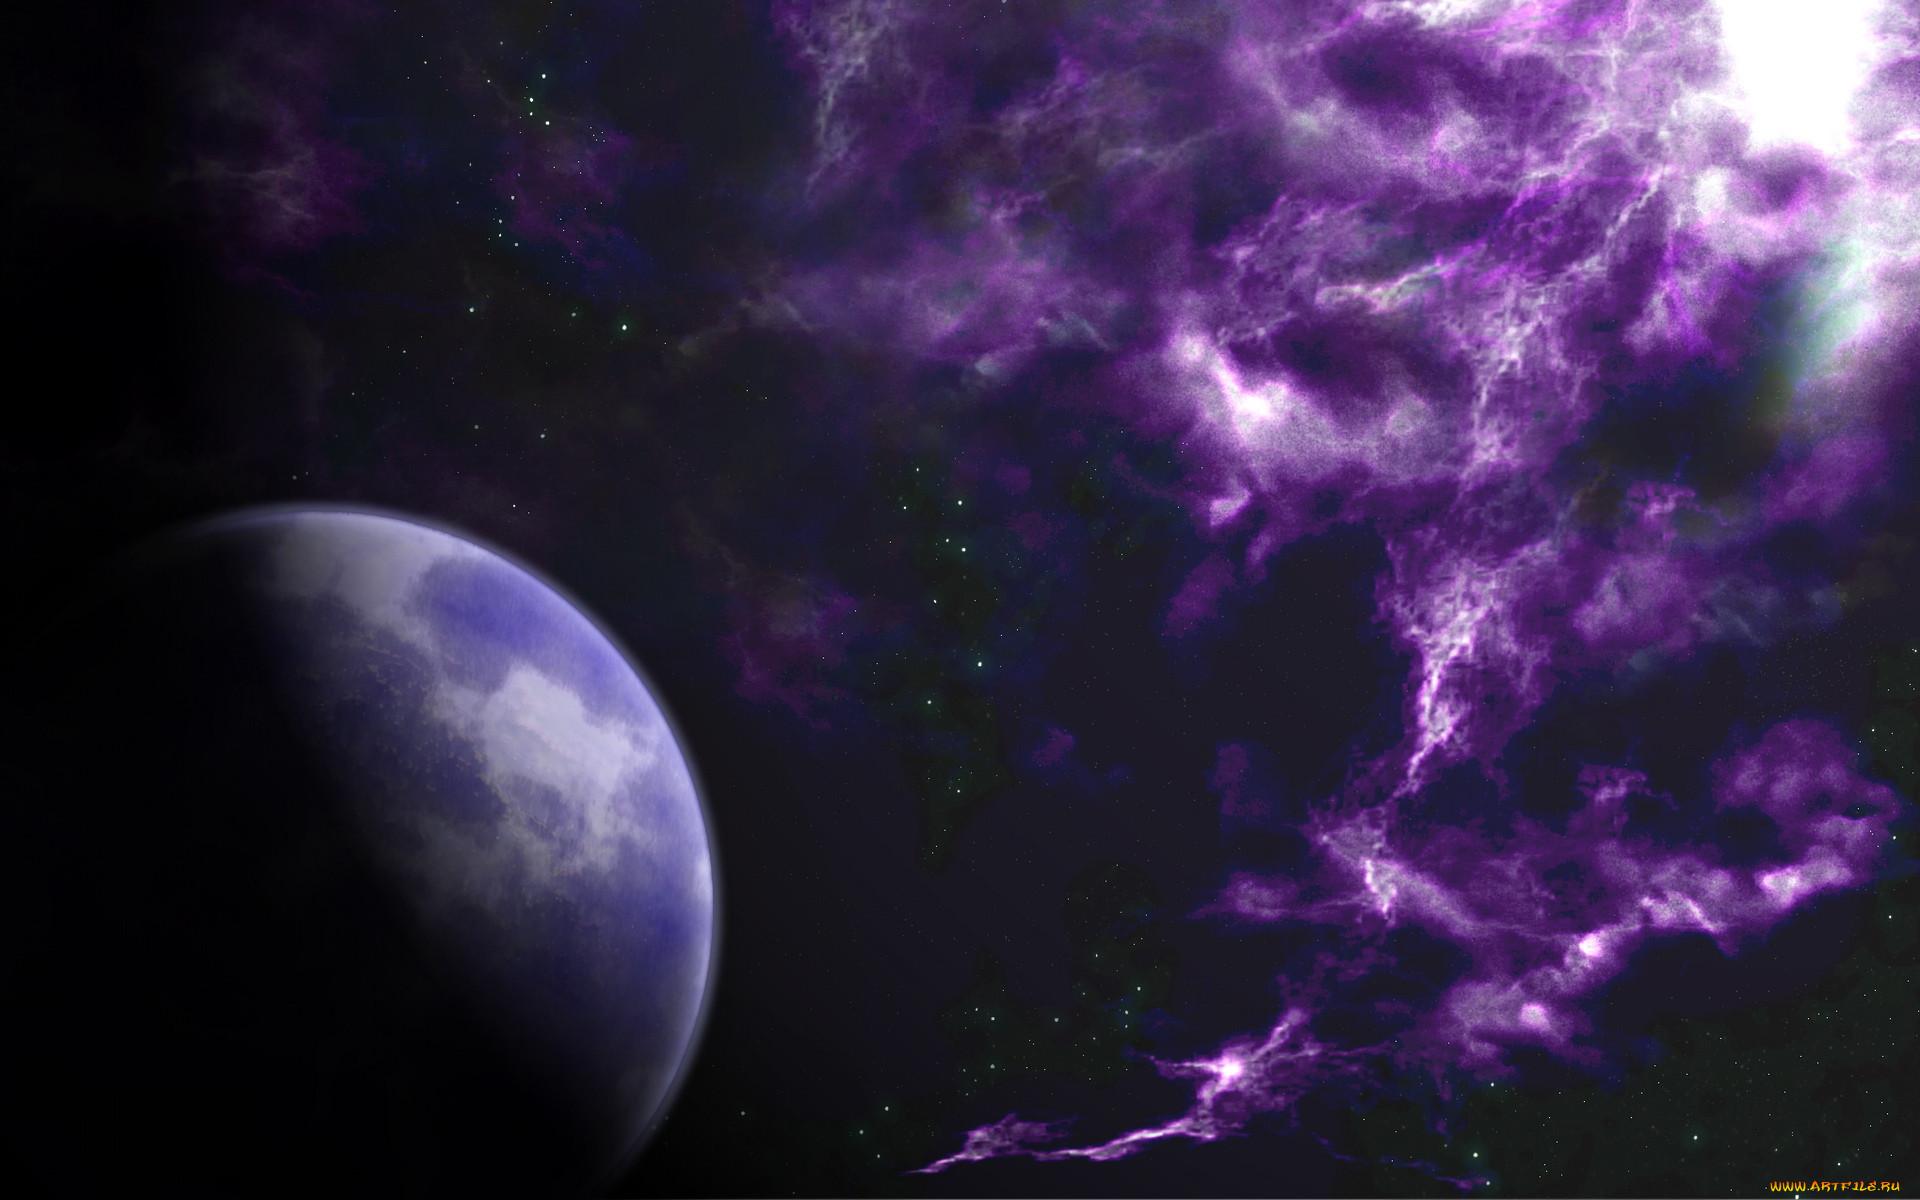 космос, арт, планета, галактика